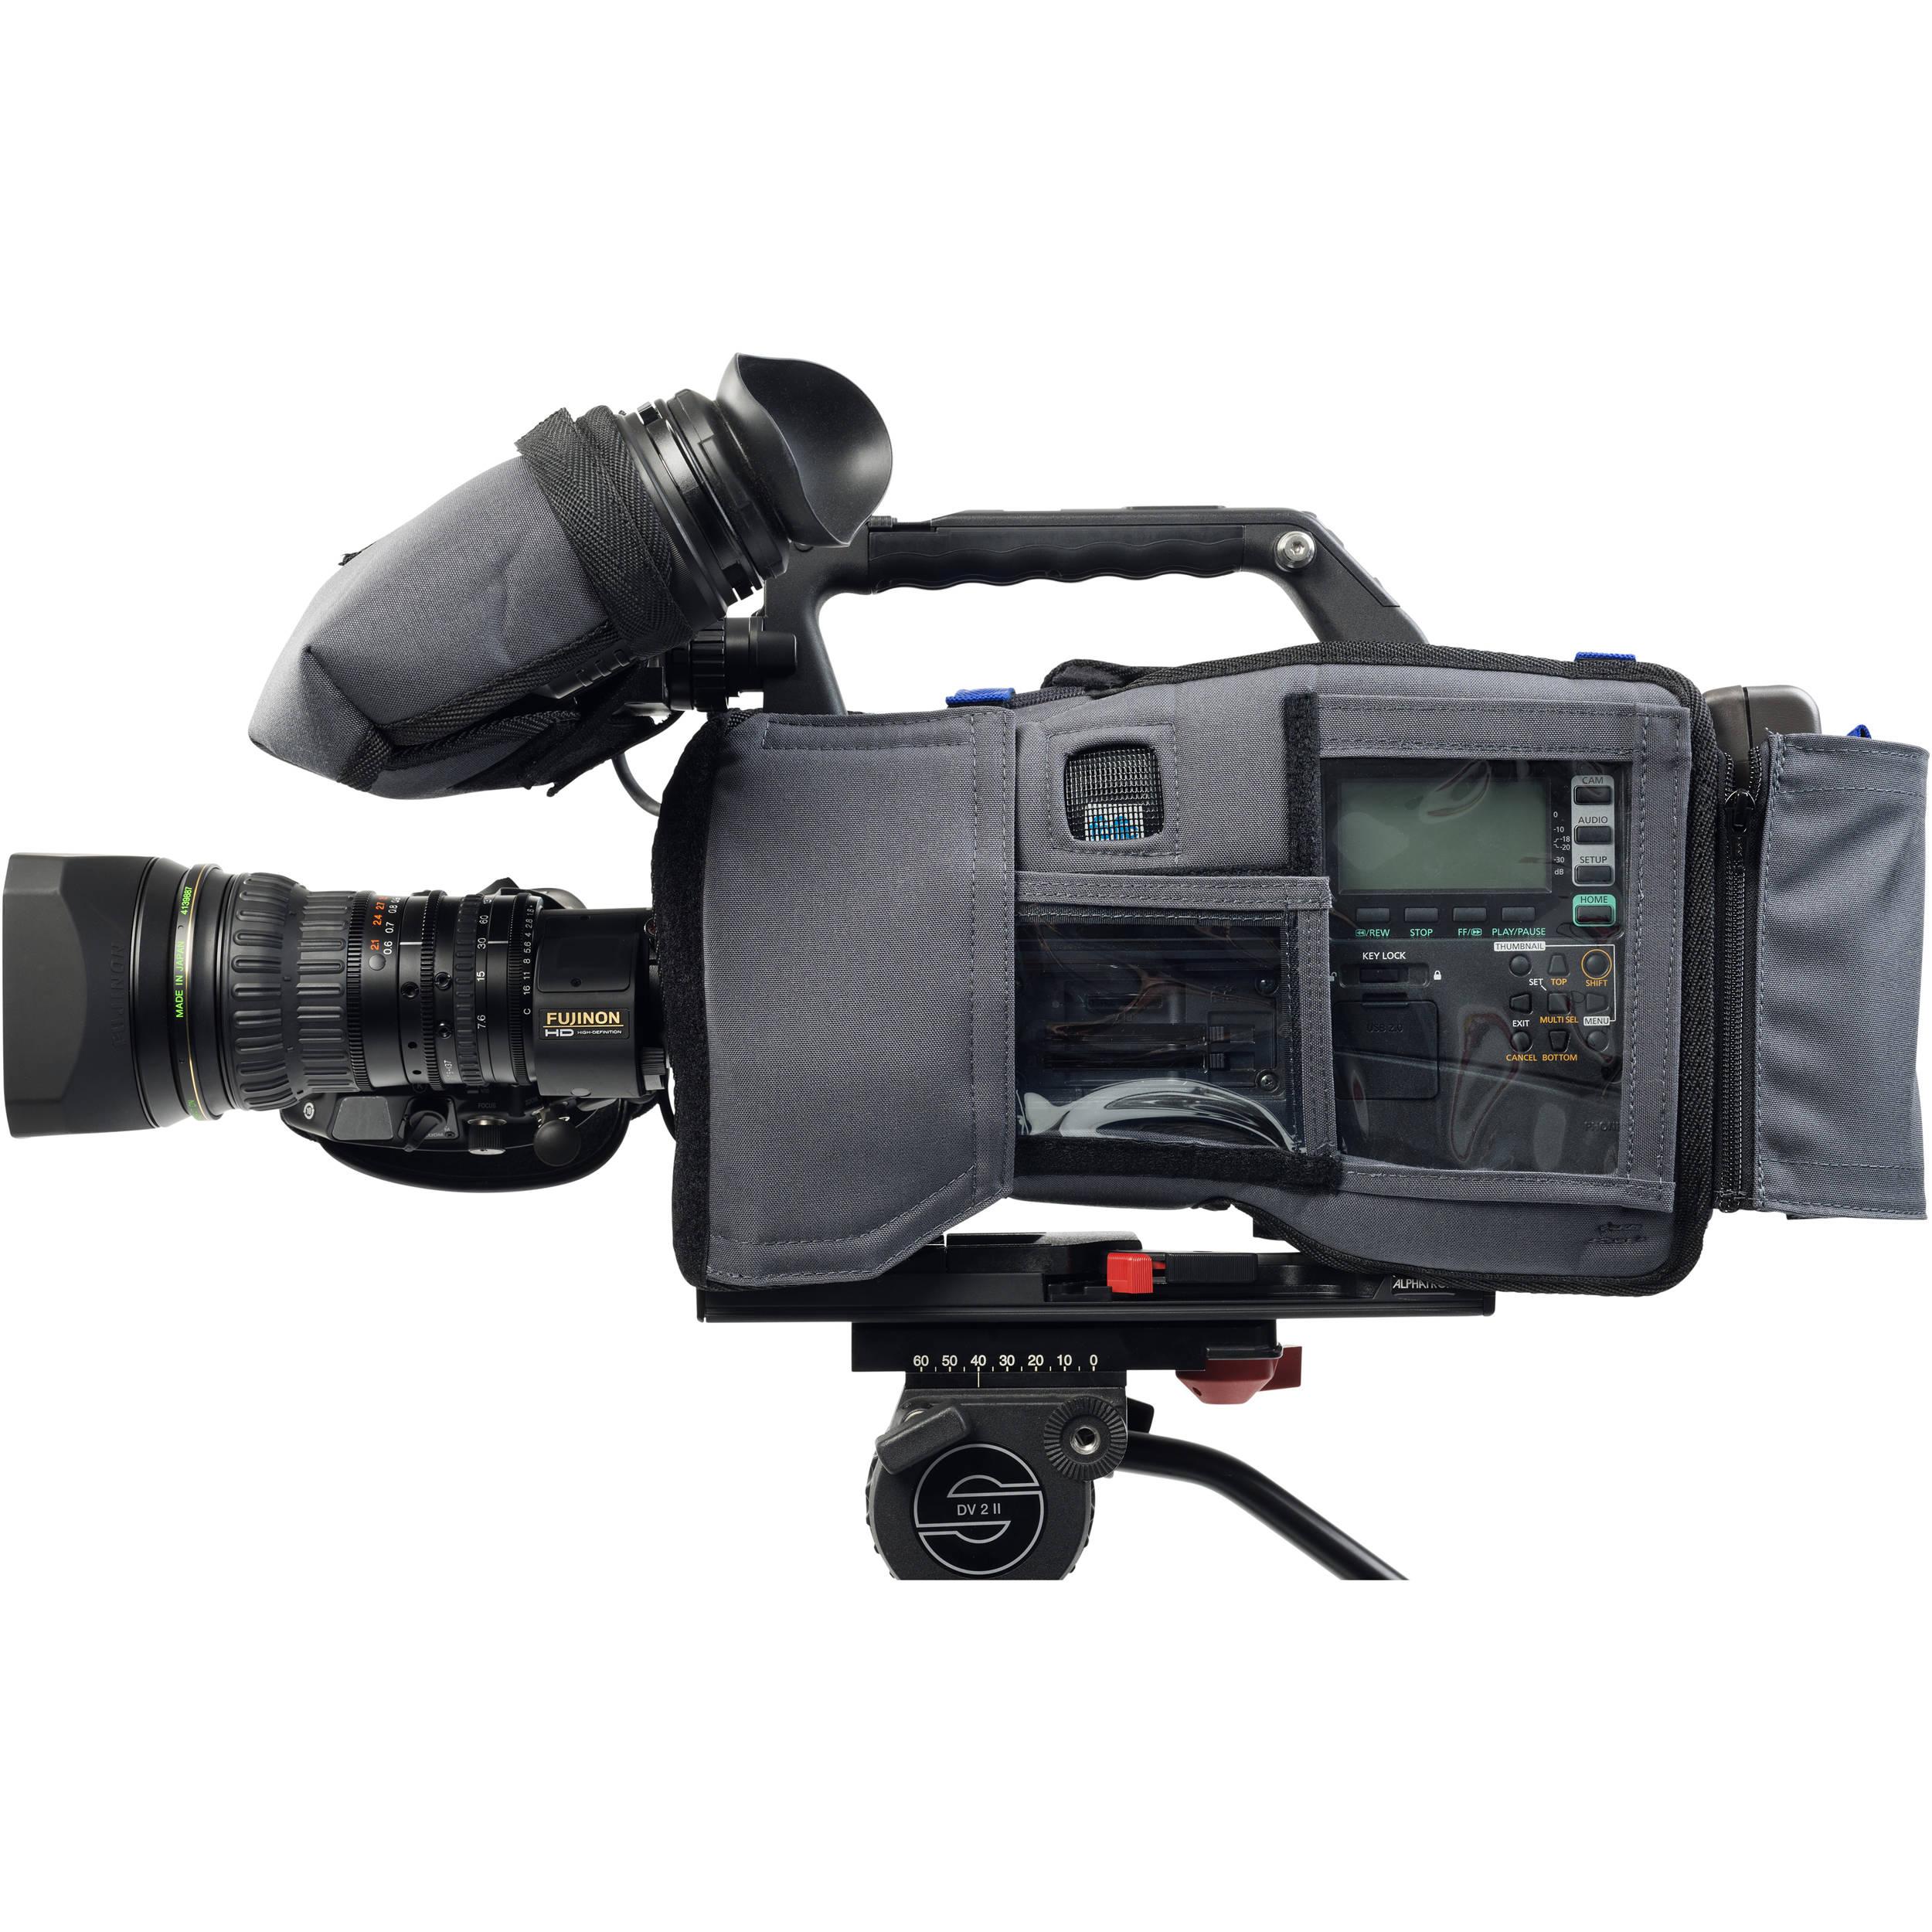 Https C Product 889406 Reg Olympus Mzuiko Digital Ed 40 150mm F 28 Pro Mc 14 14x Teleconverter Camrade Cs Hpx 600 Camsuit 895655